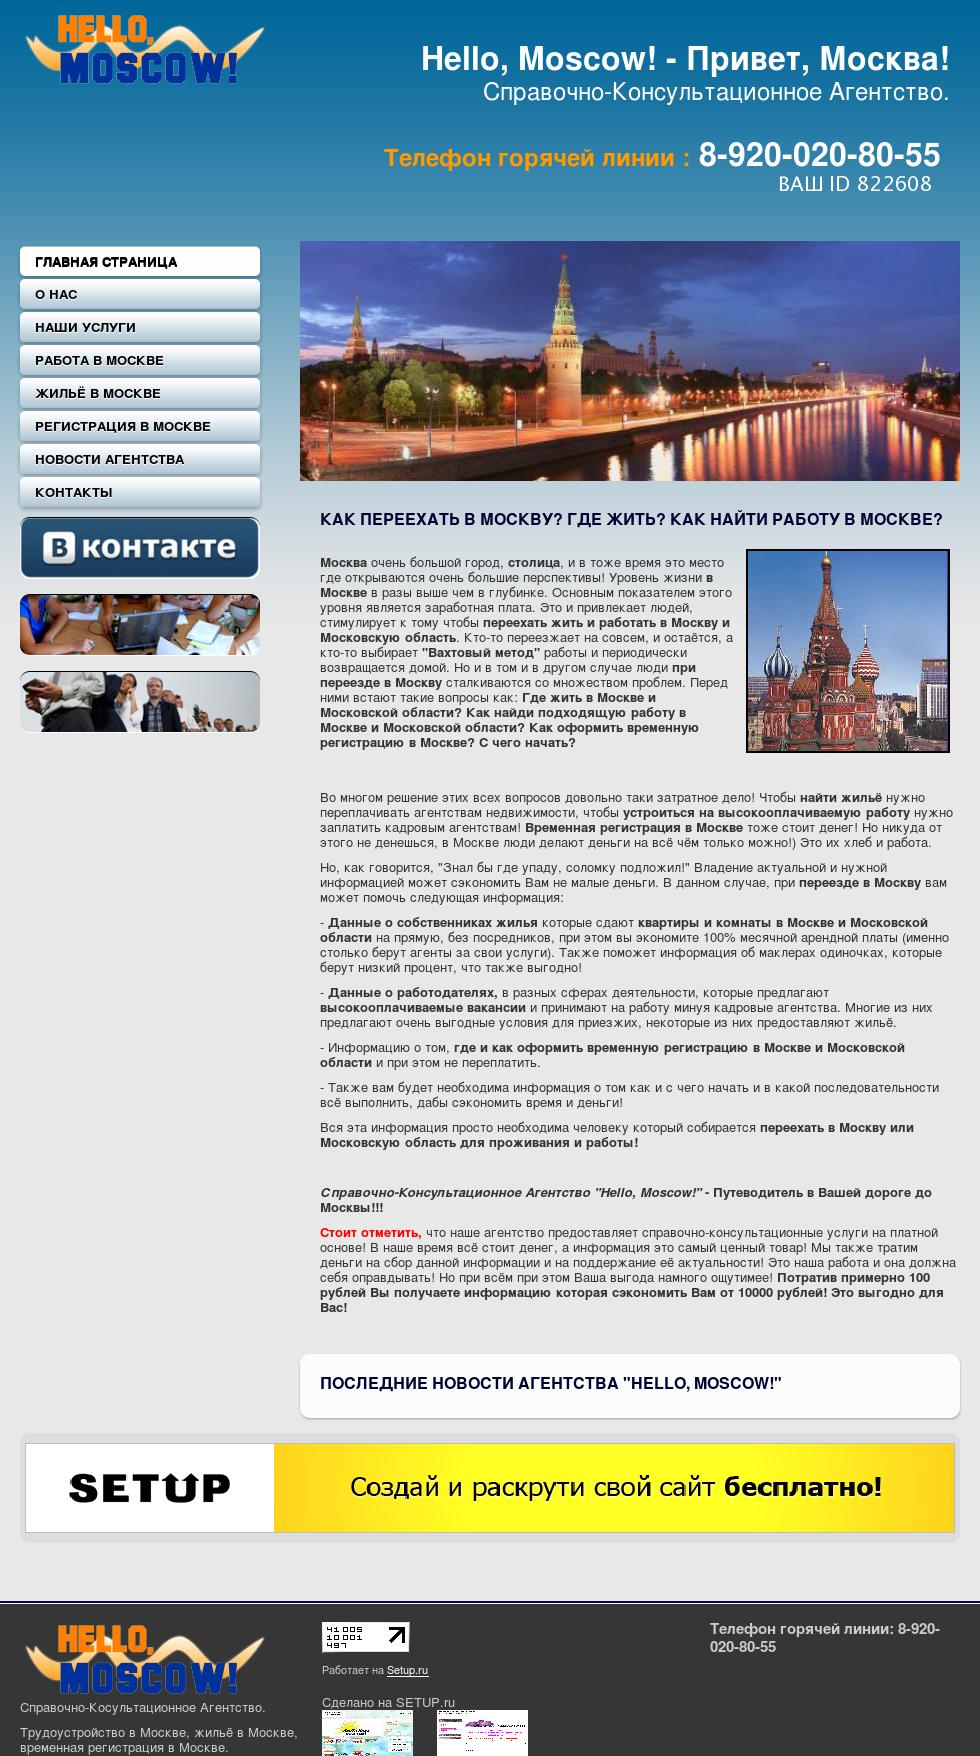 Hello, Moscow! - Привет, Москва!  Справочно-Консультационное Агентство.